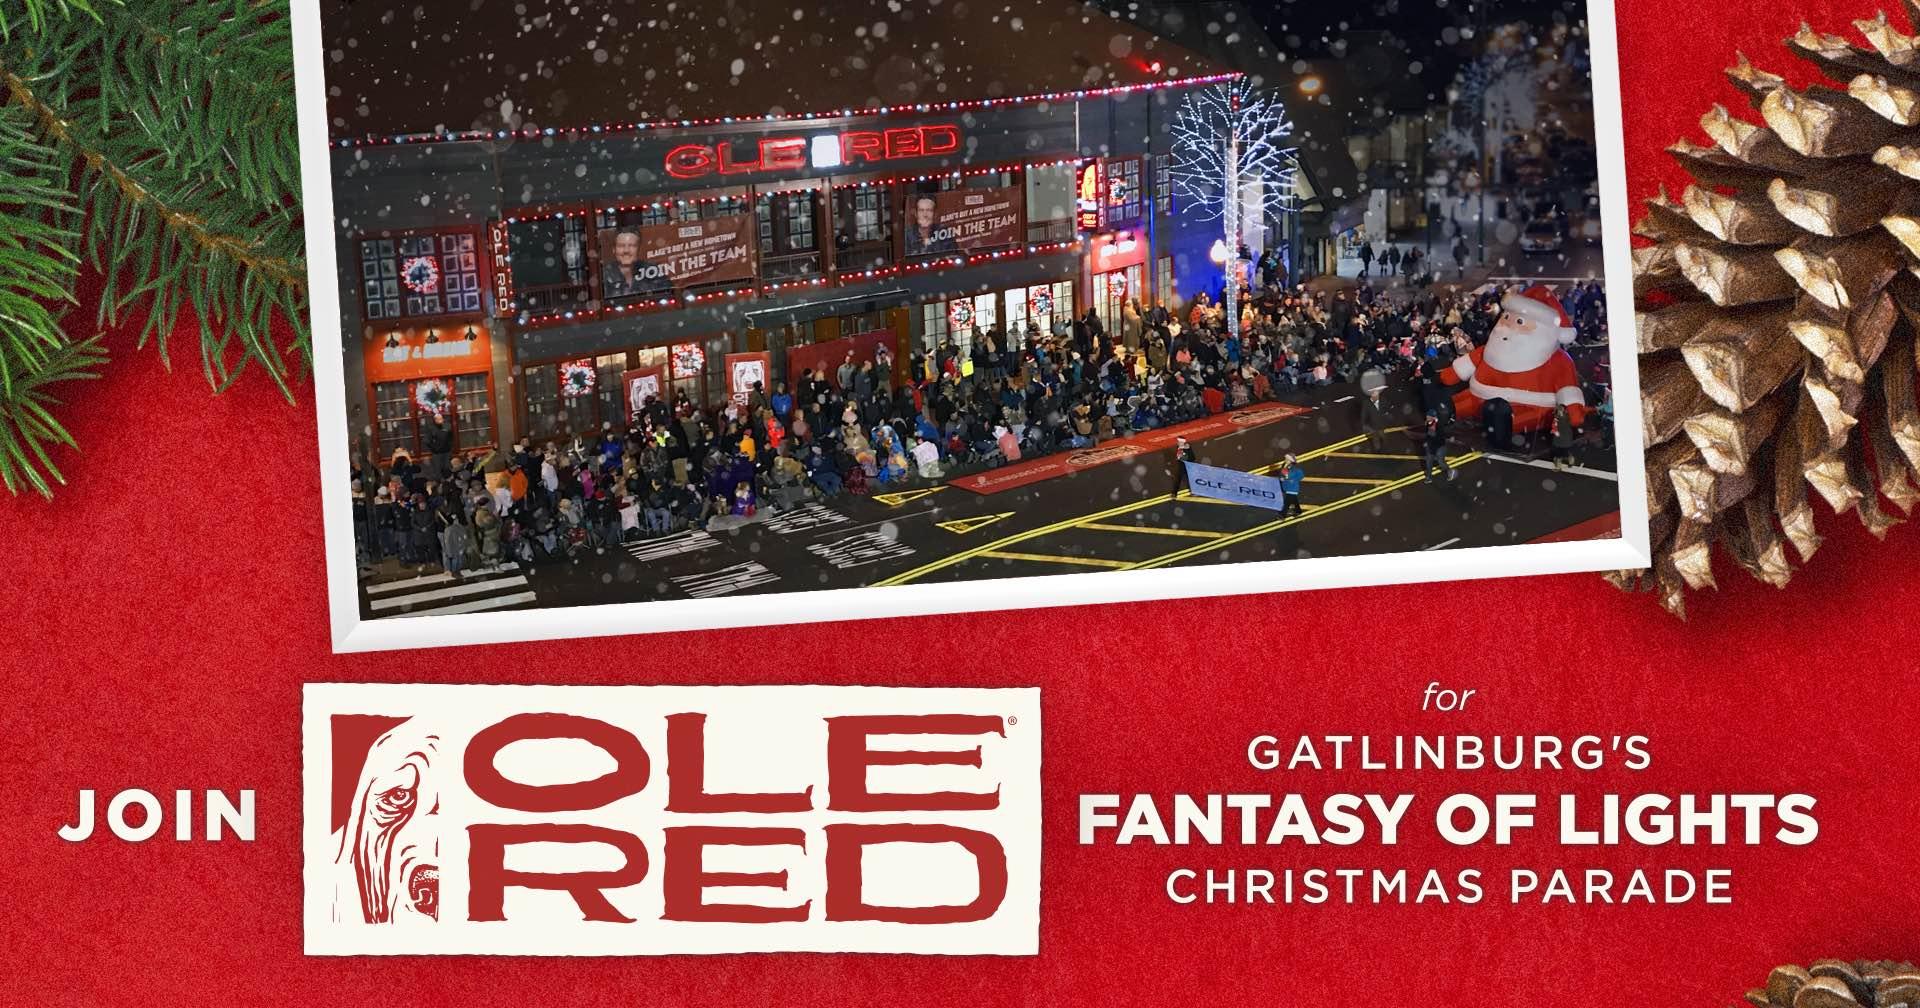 Seating Gatlinburg Christmas Parade 2020 Fantasy of Lights Christmas Parade   Ole Red Gatlinburg